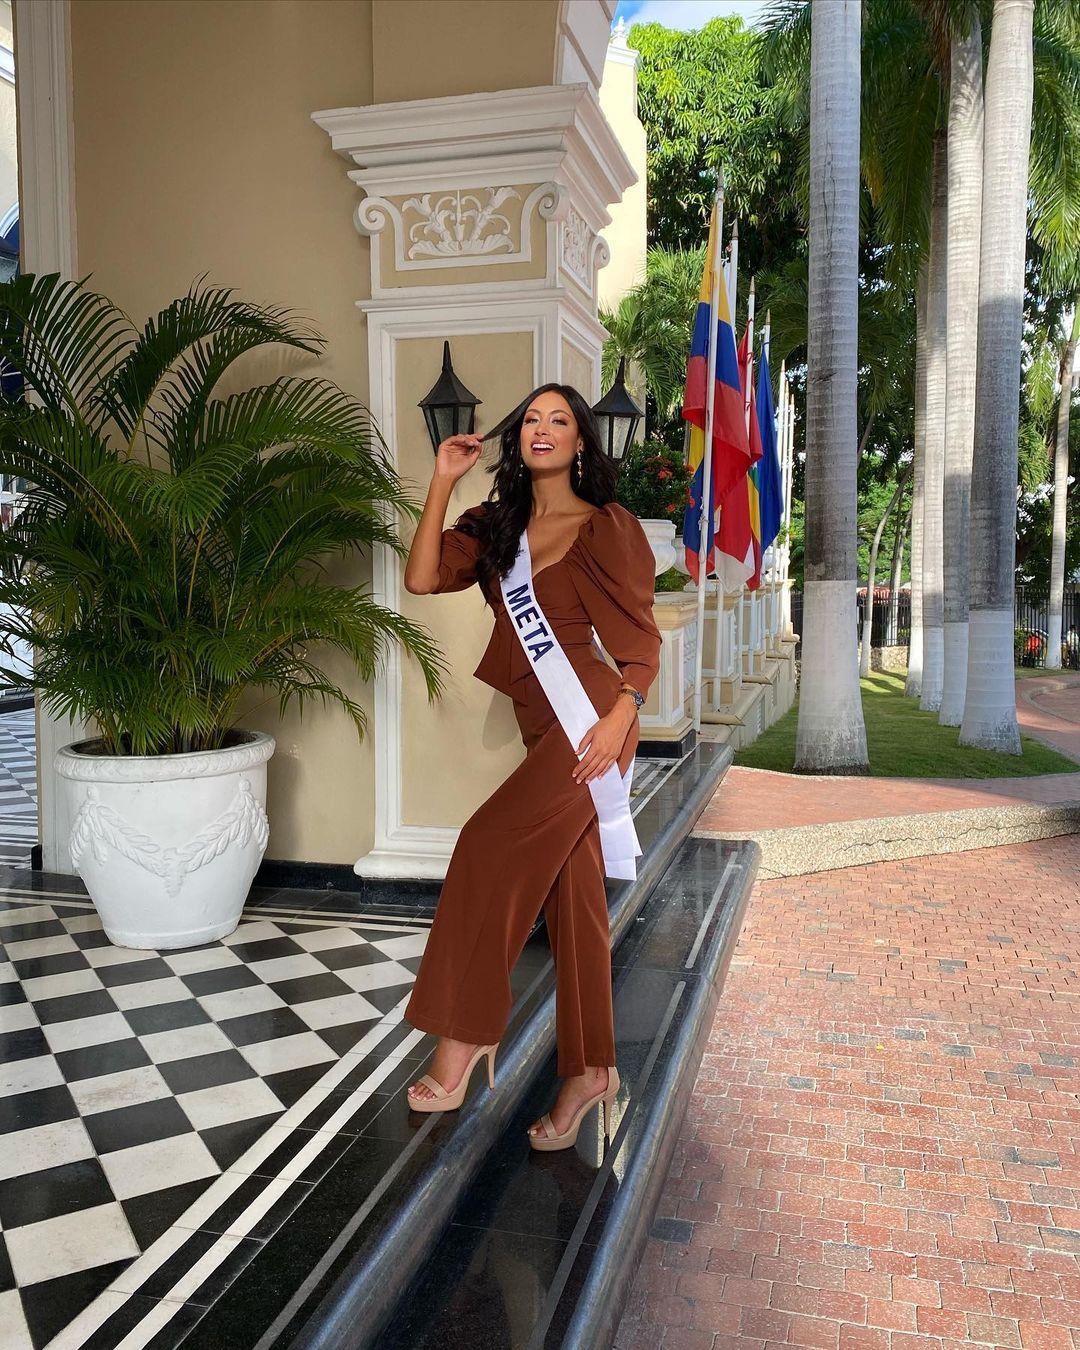 juliana franco, top 16 de miss colombia universo 2020/miss earth water 2017. - Página 21 Julifr26